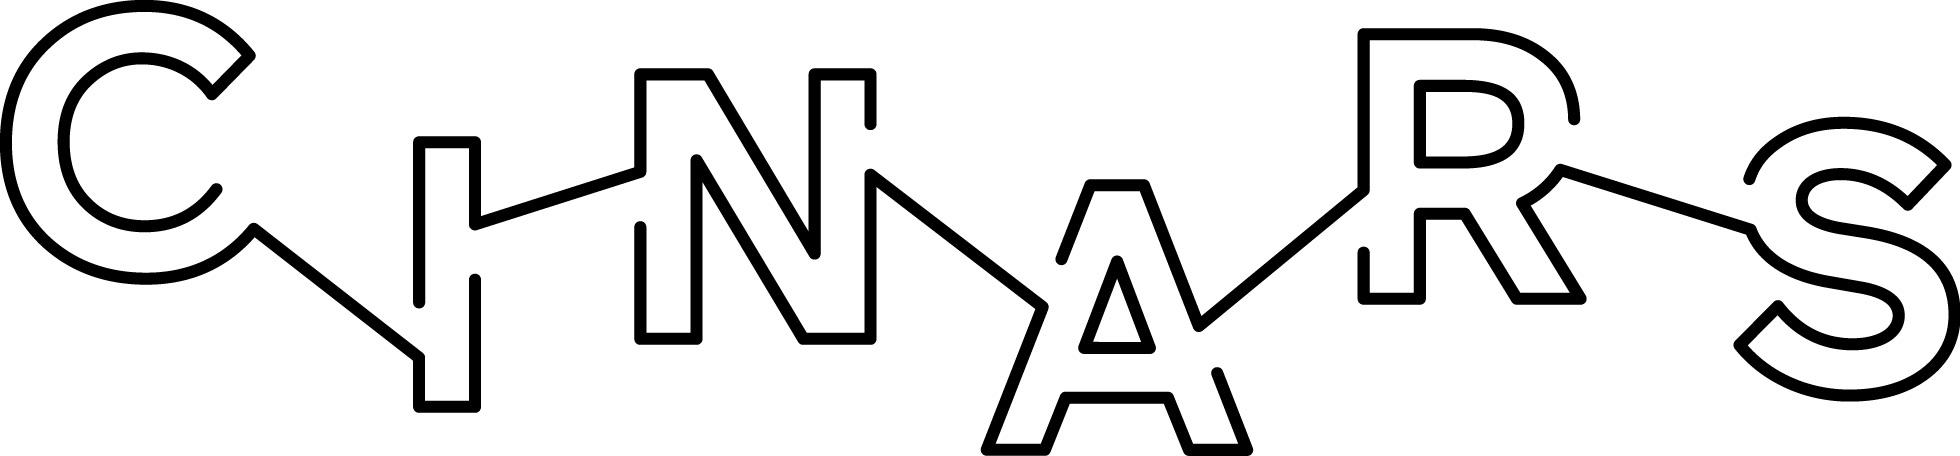 CINARS logo